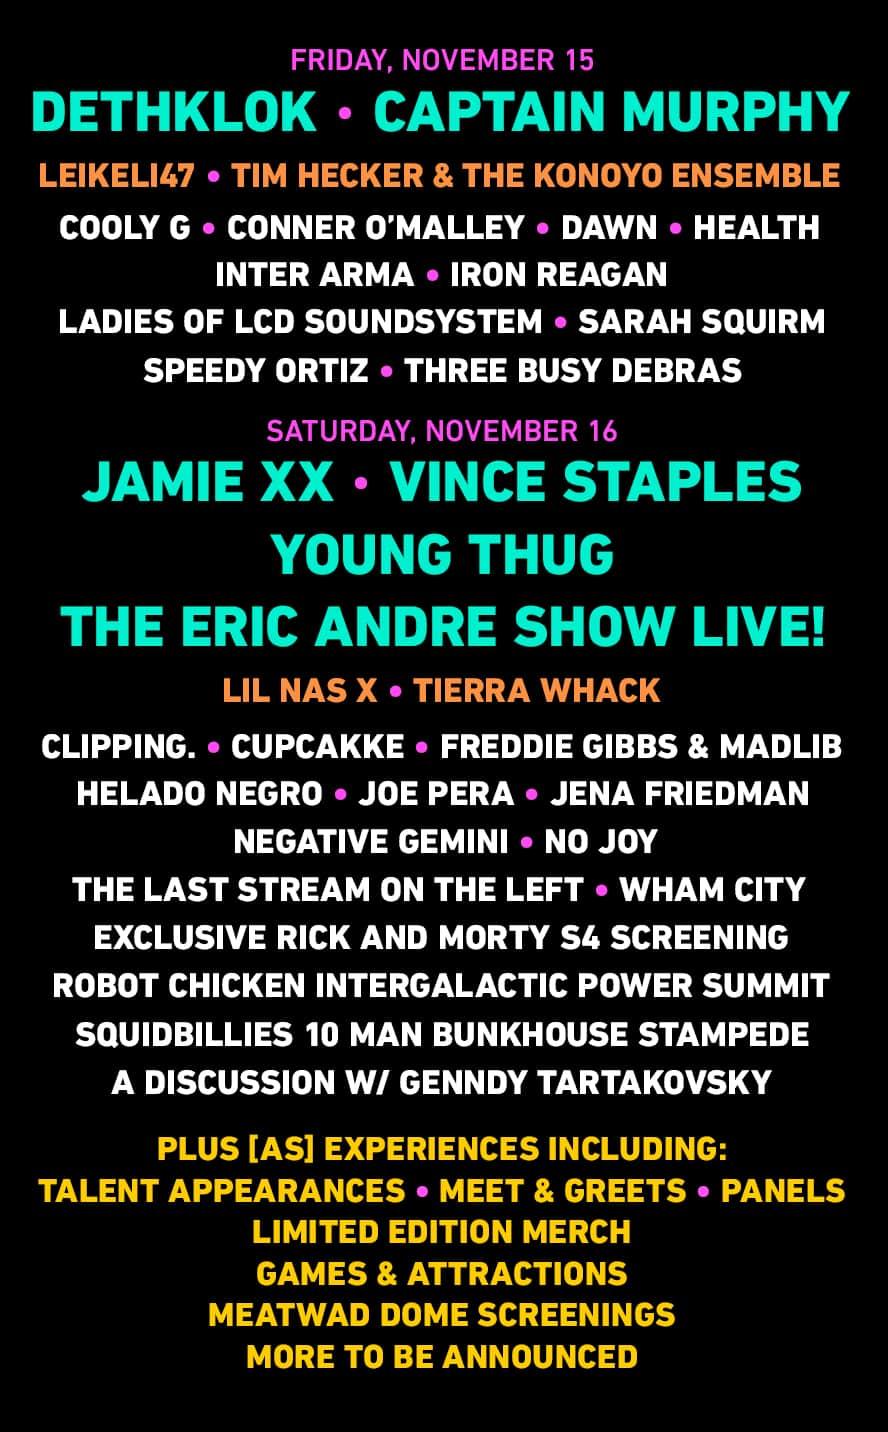 Adult Swim Festival 2020 - ADULT SWIM FESTIVAL  November 15 & 16 @ Banc of California Stadium